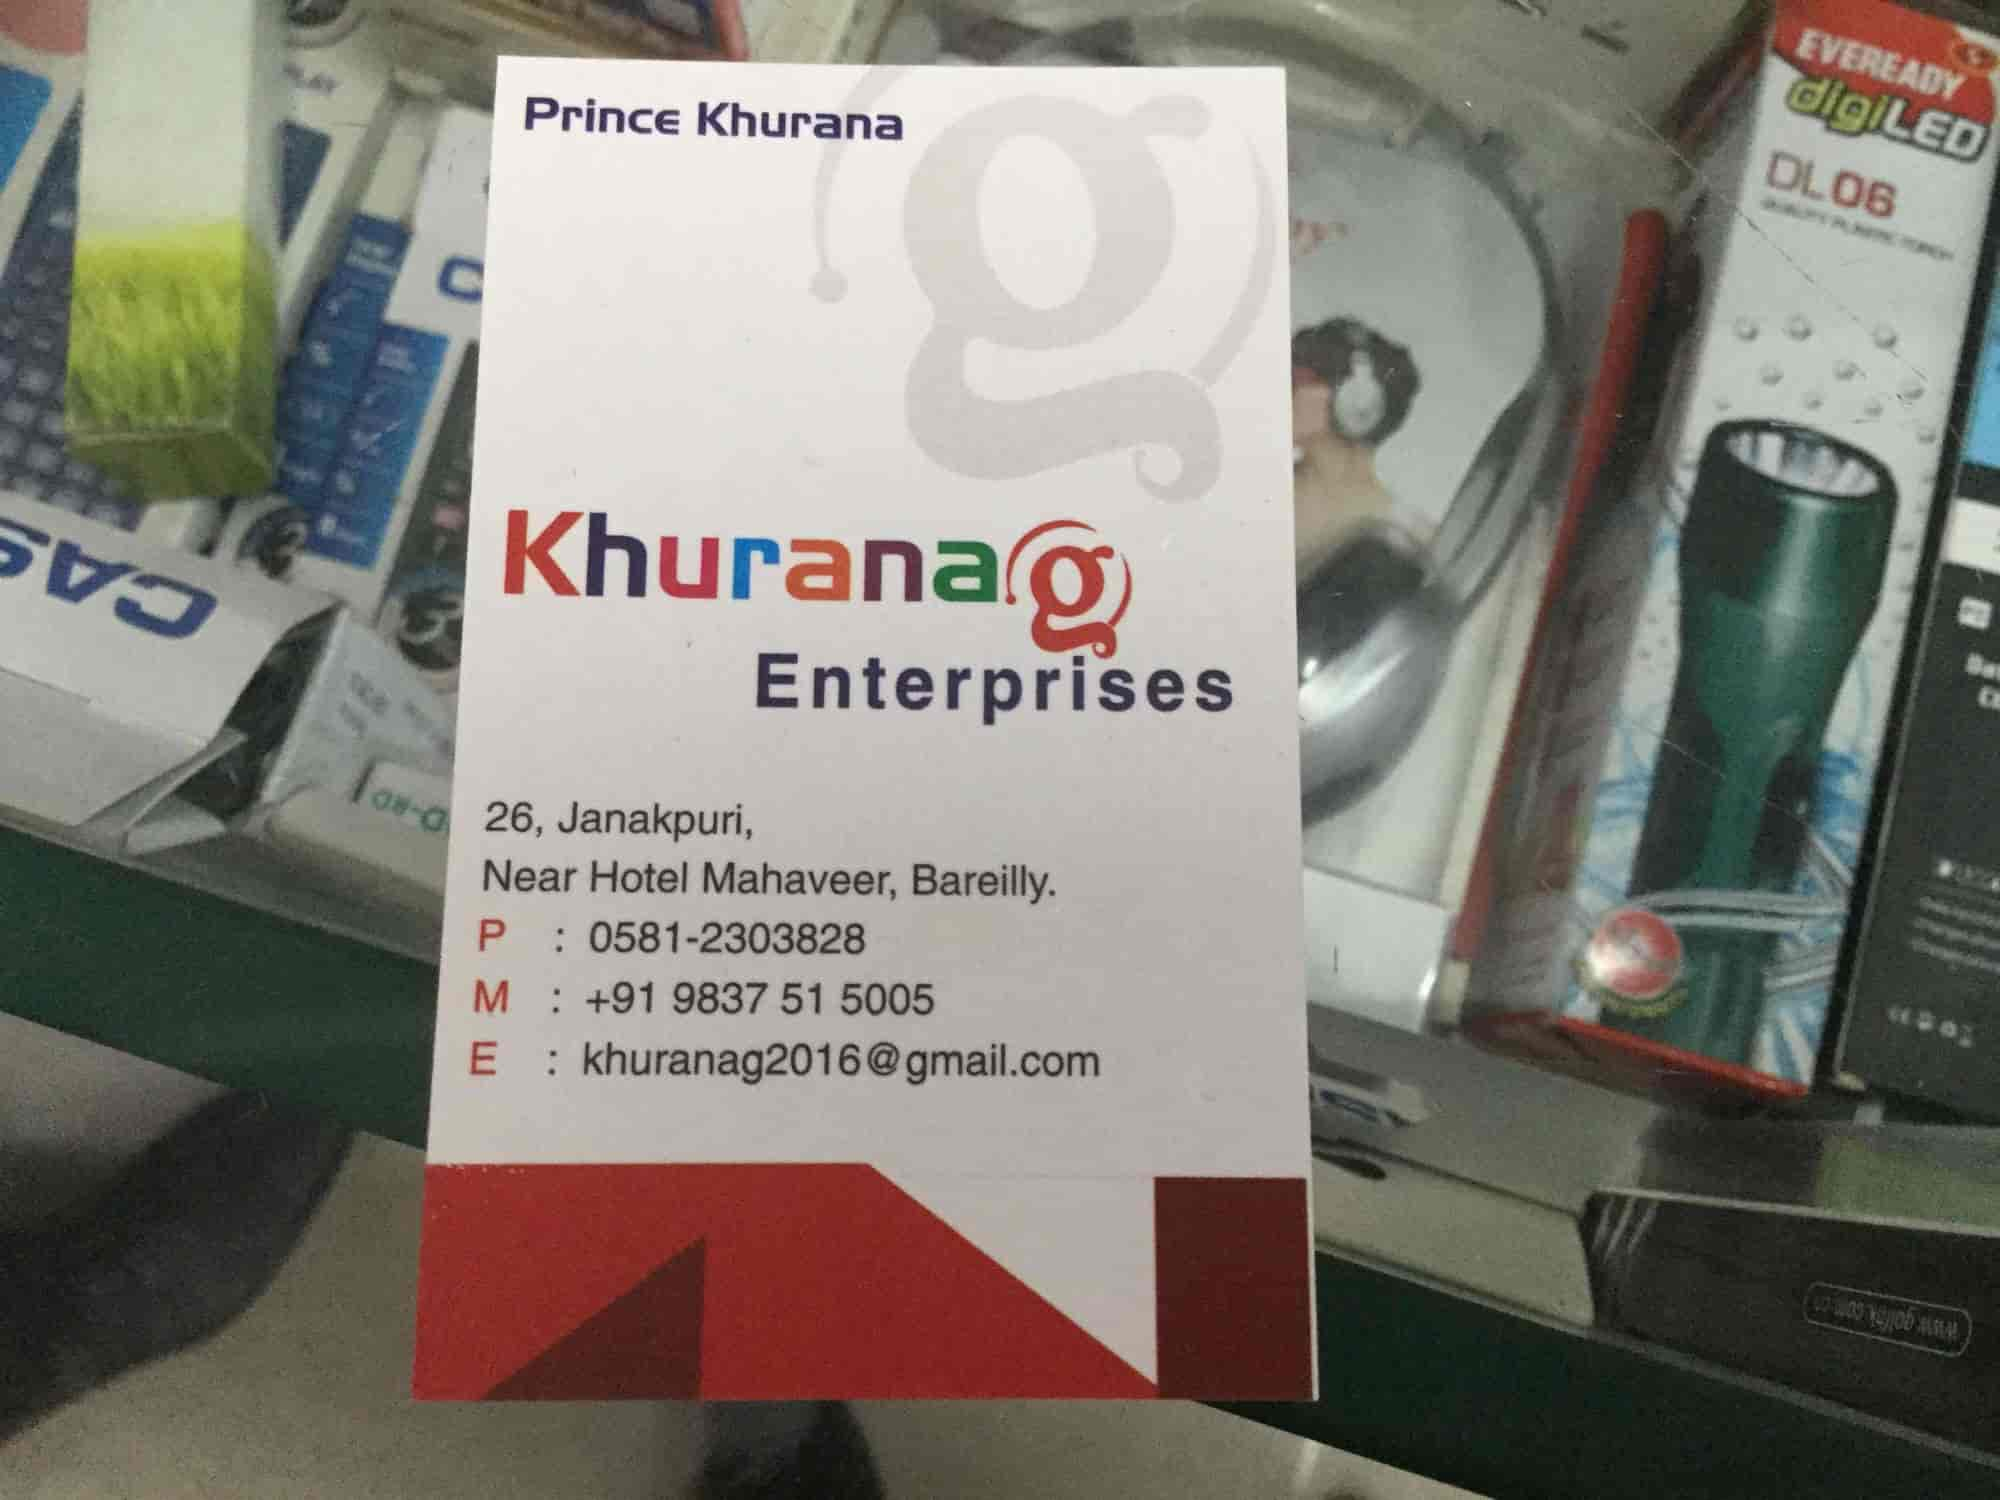 Khurana Enterprises Photos, Janak Puri, Bareilly- Pictures